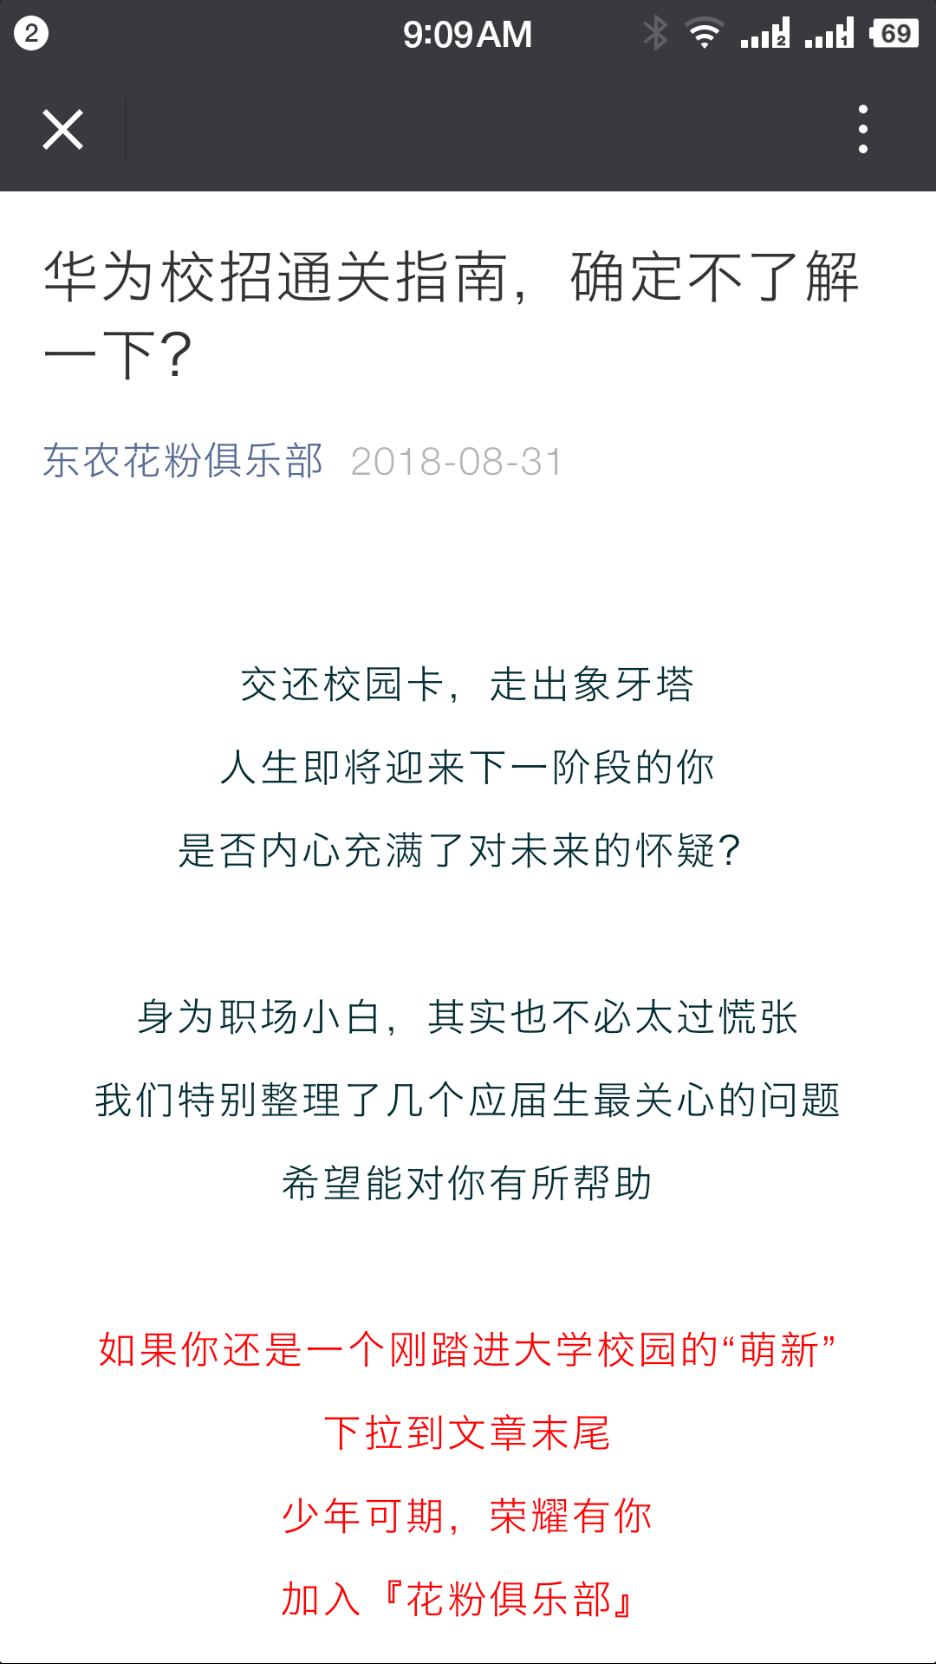 Screenshot_2019-02-07-09-09-46-735_WeChat.png